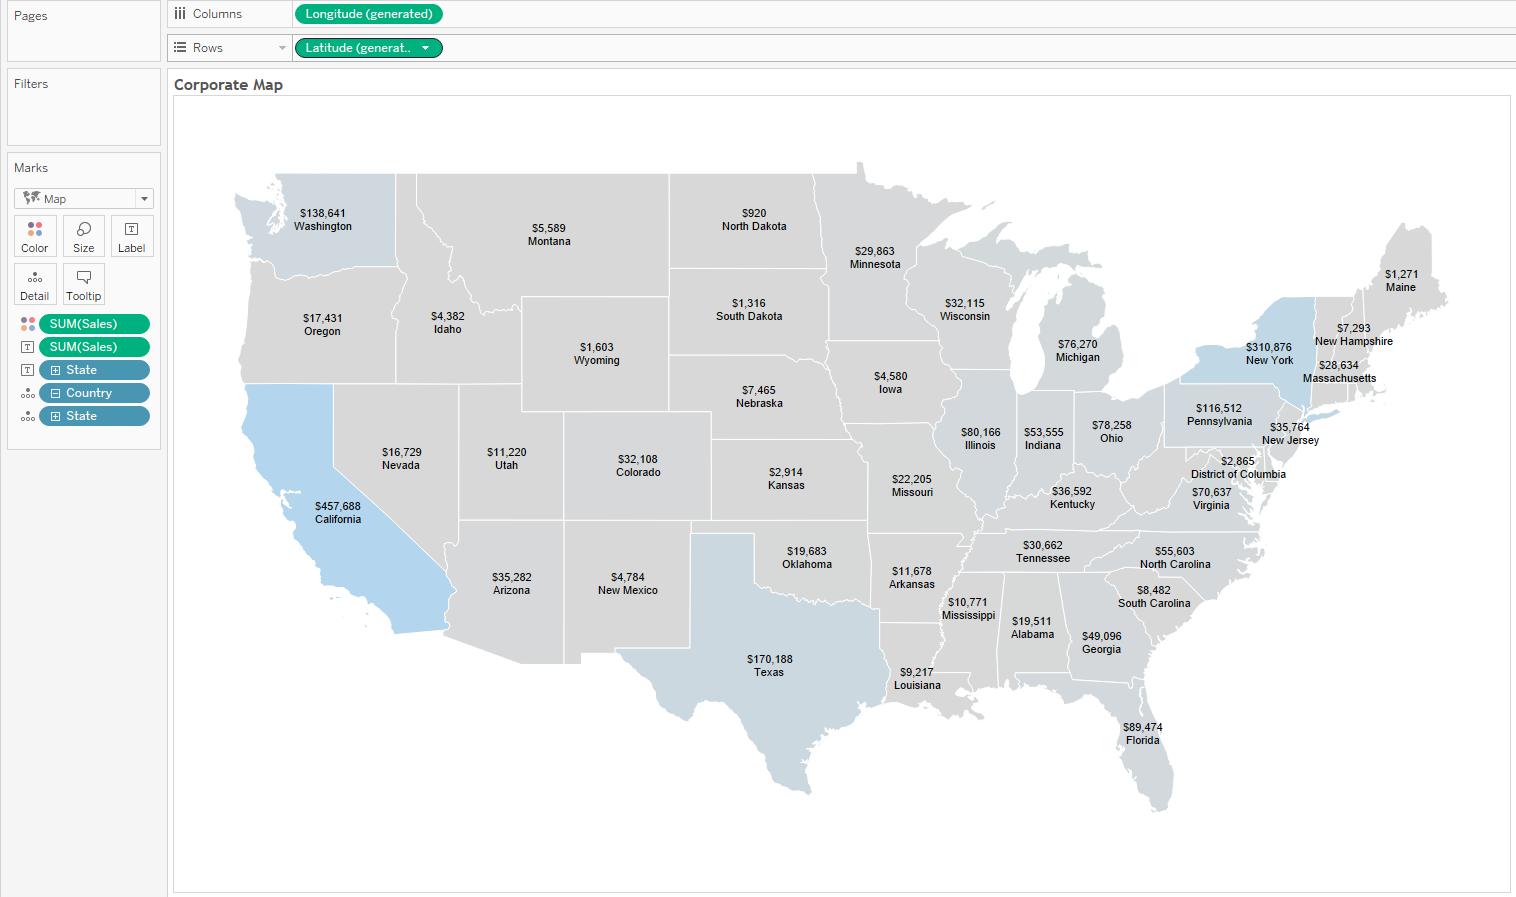 Corporate-Map